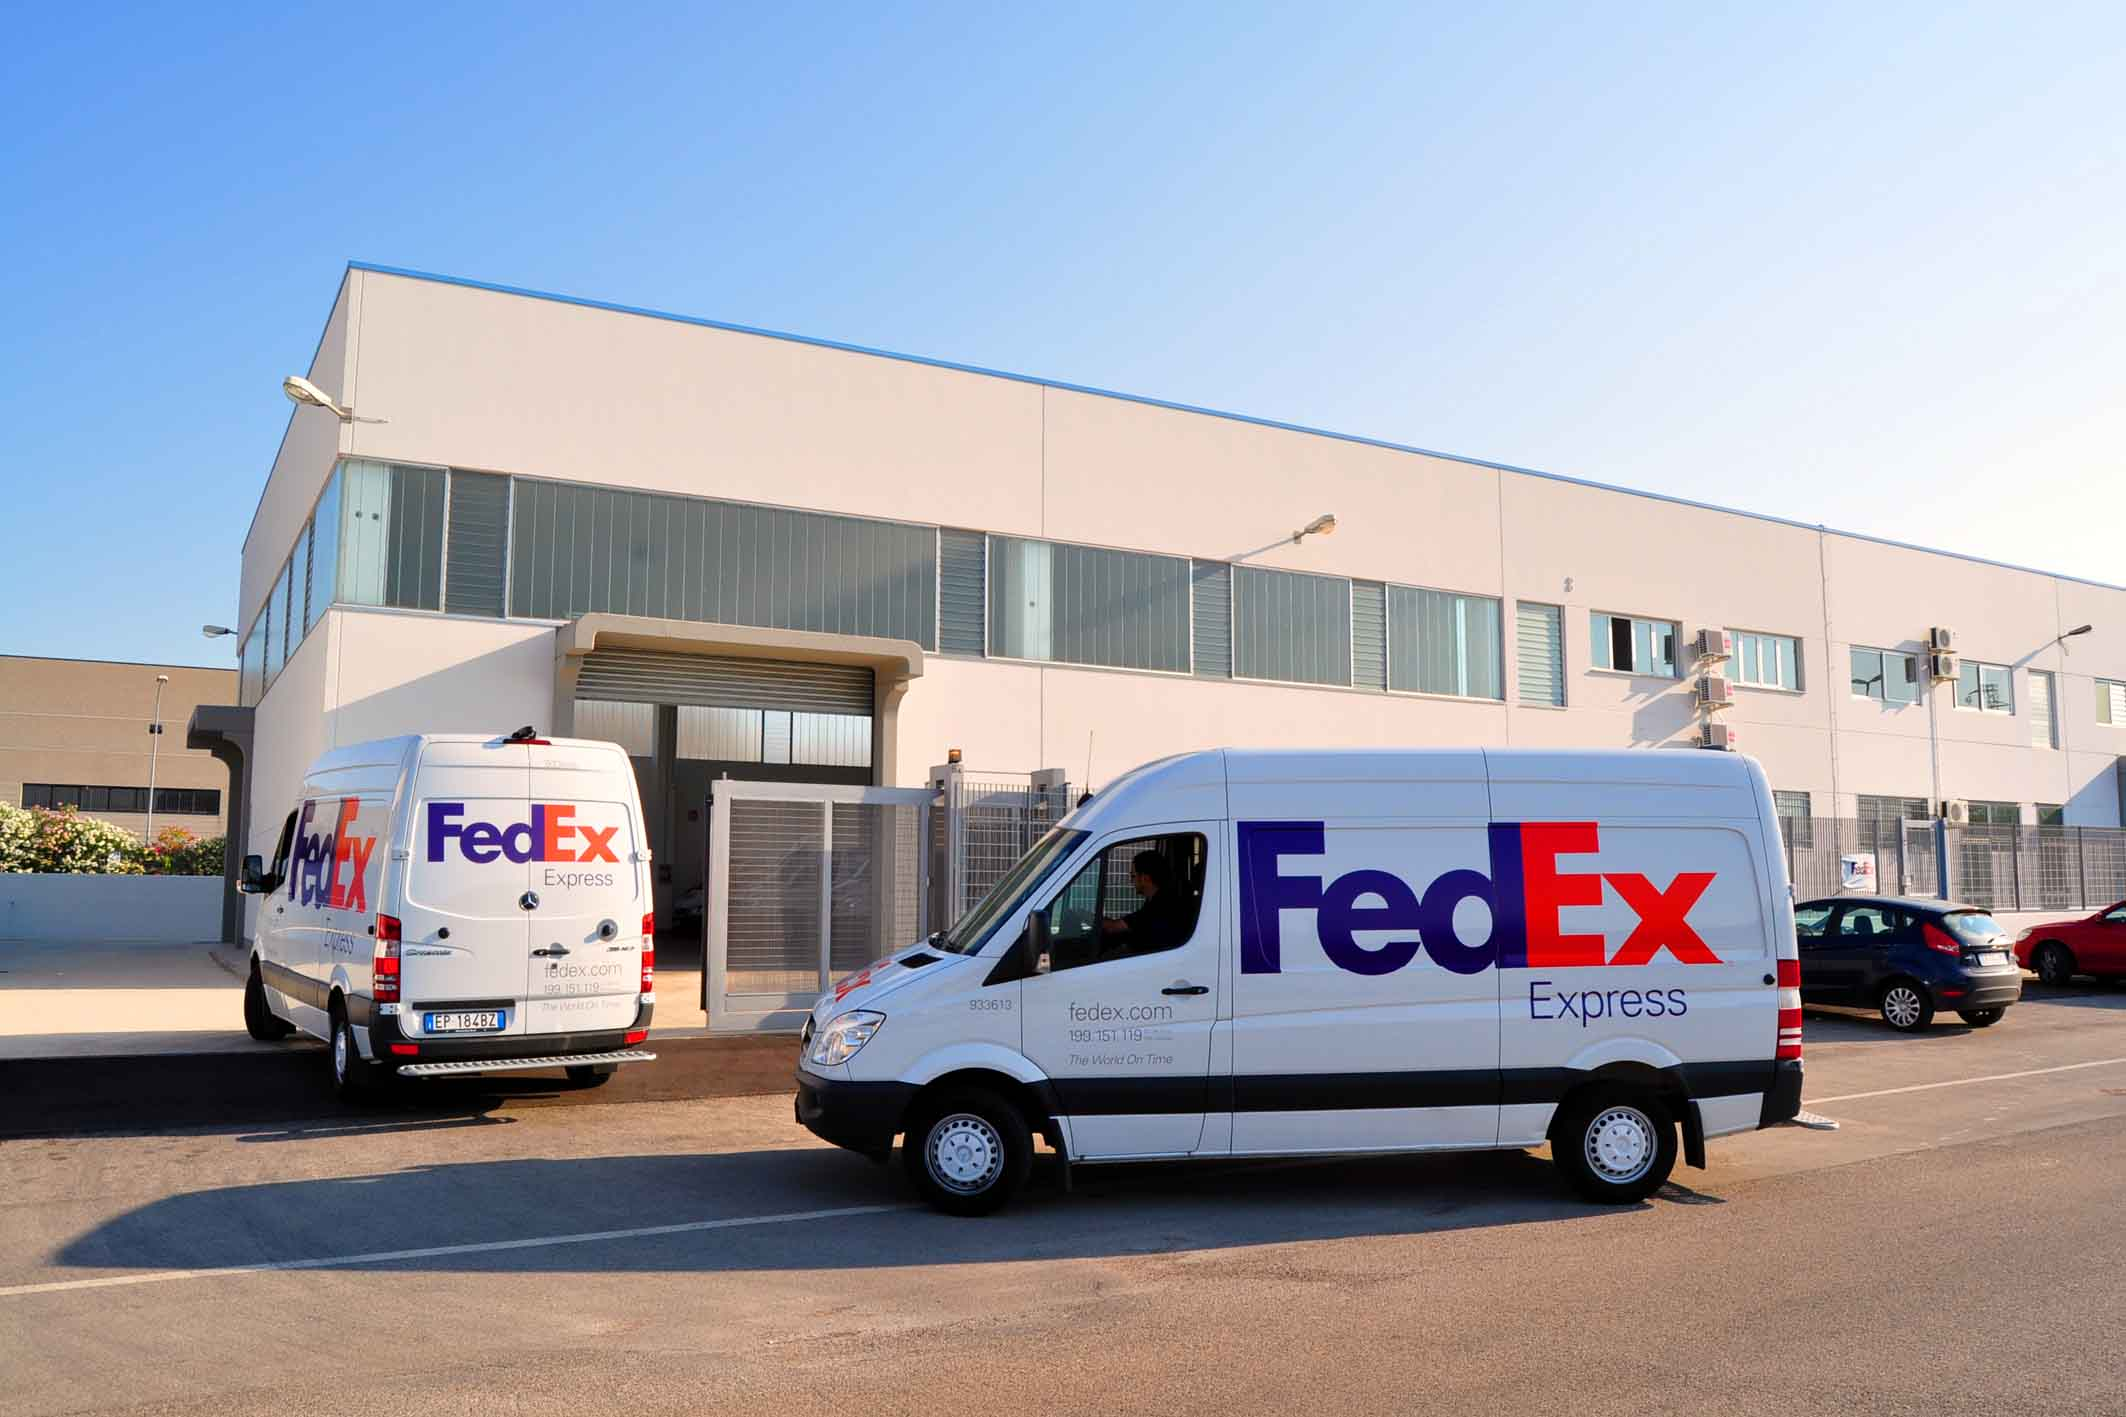 fedex marketing Fedex corp will slash its marketing budget by 25 percent this year, the company said.